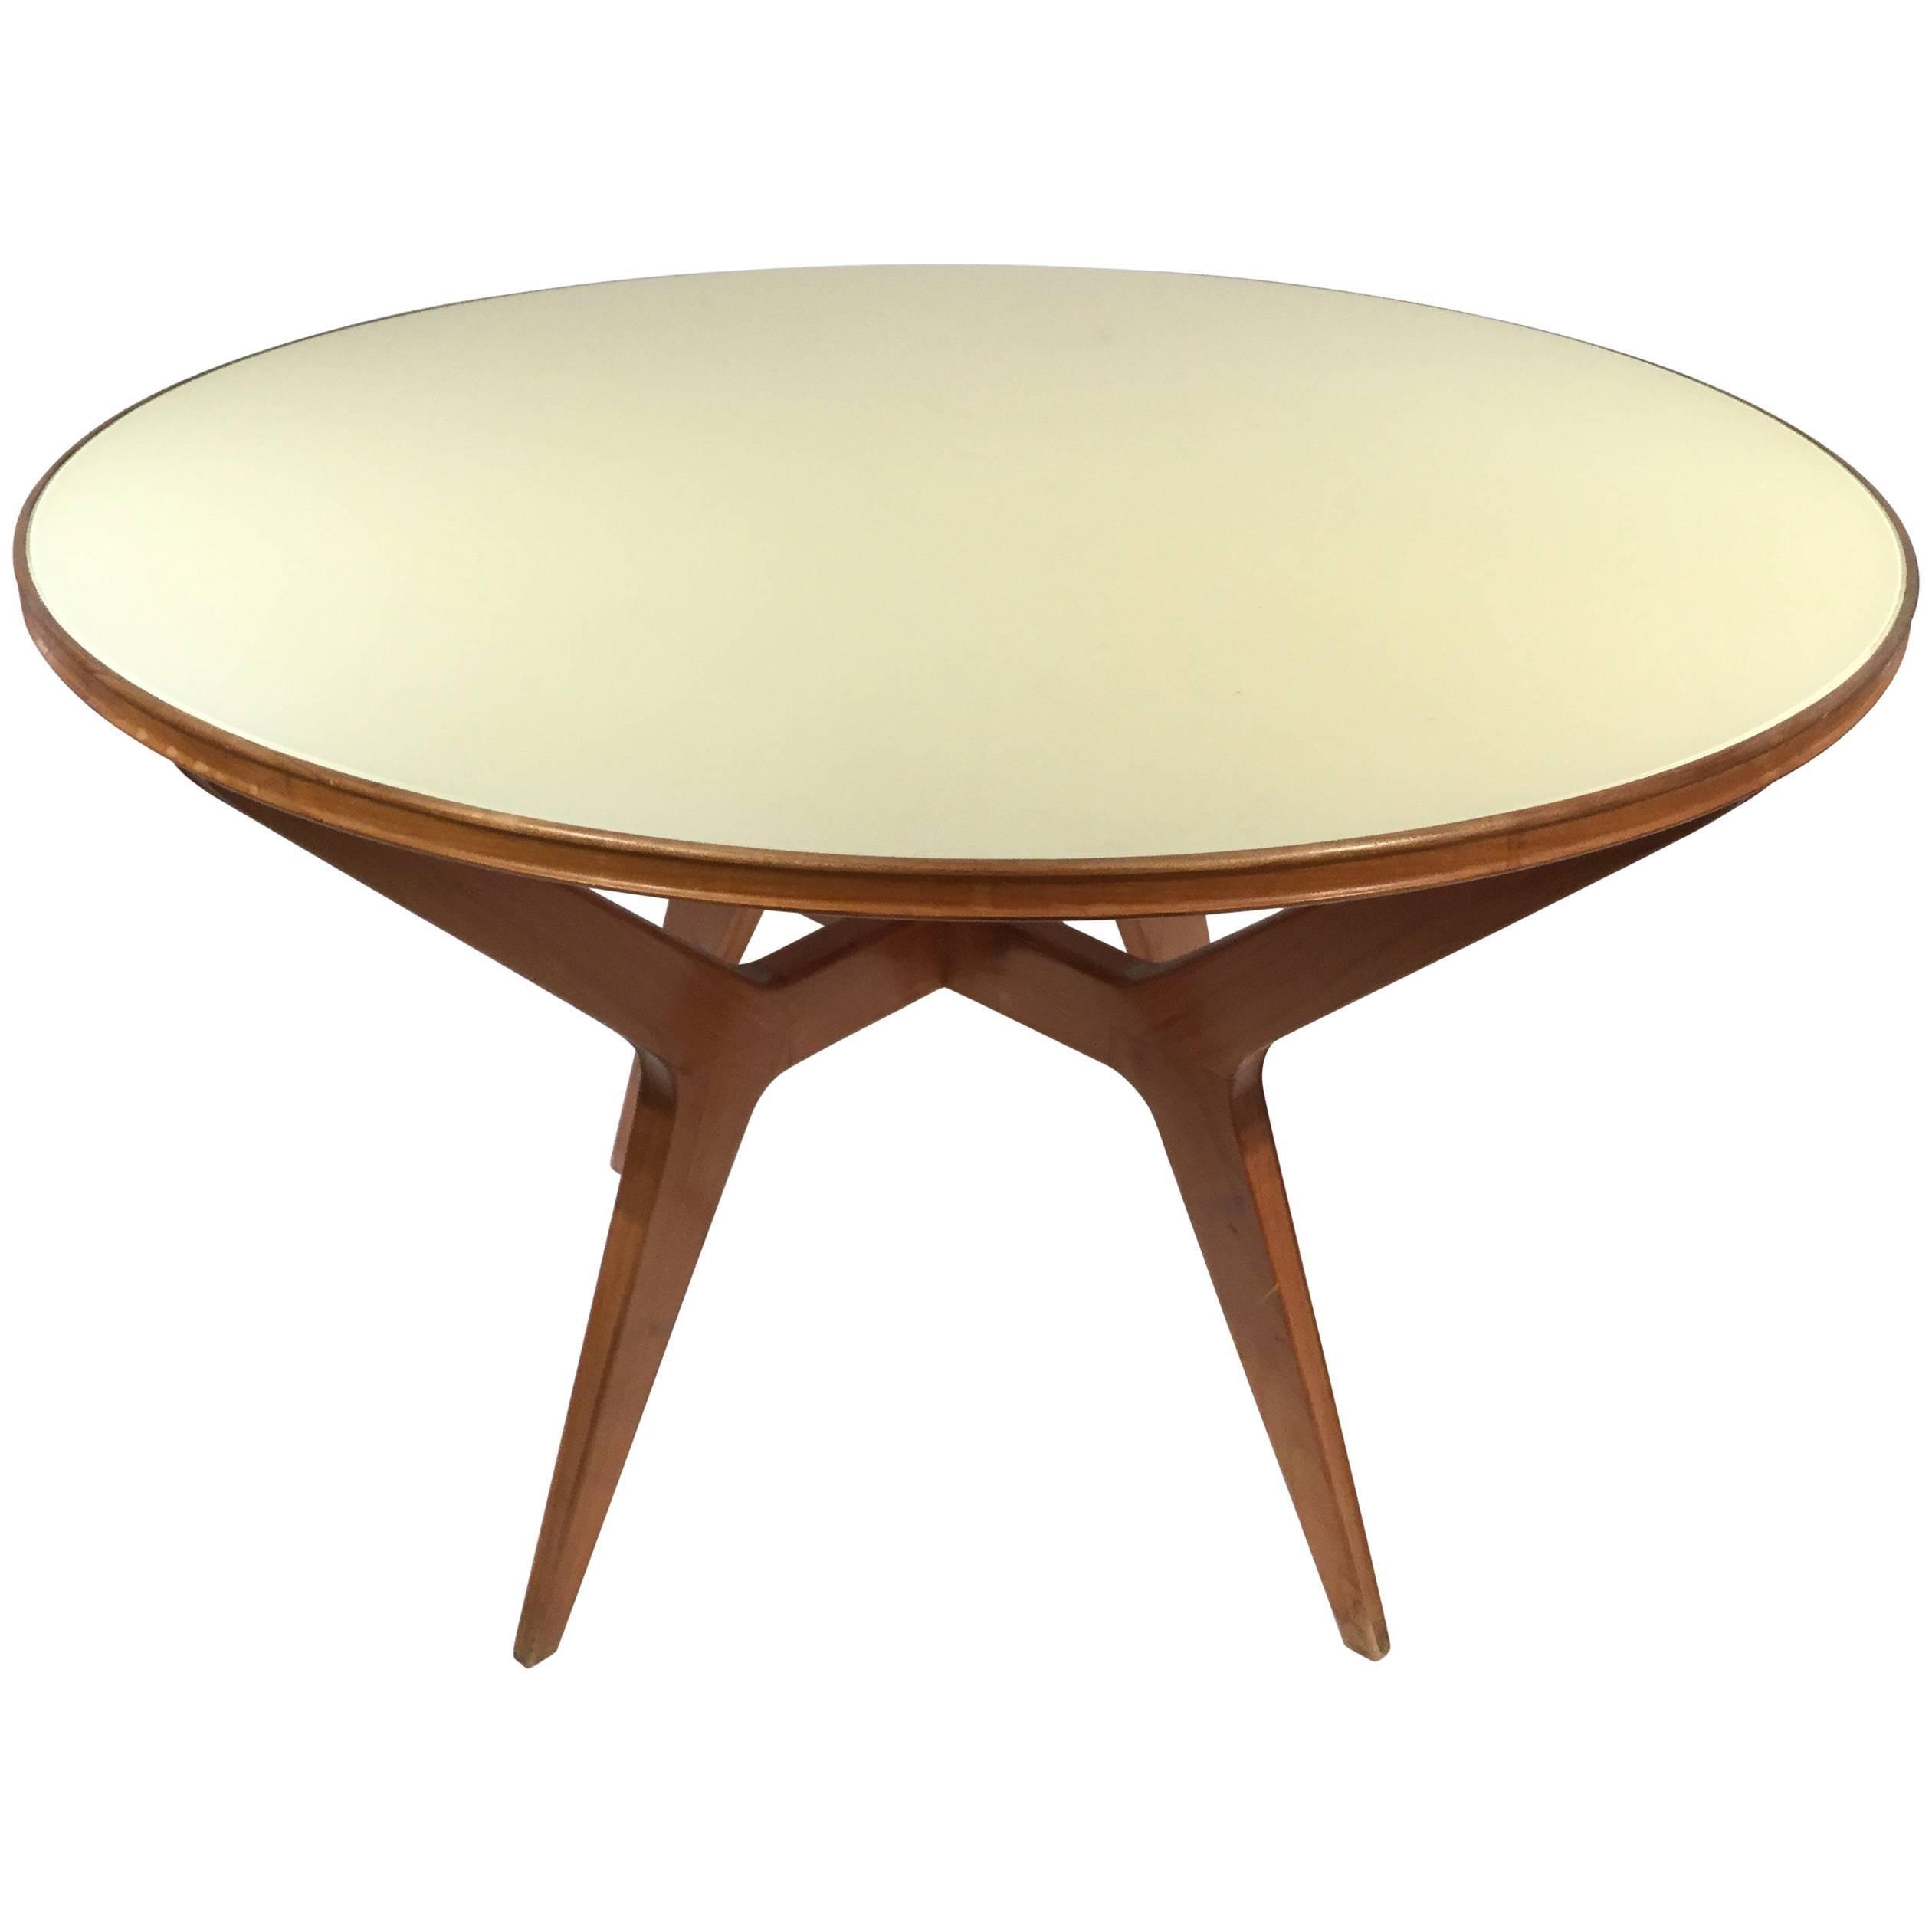 Italian Designed Circular Dinning Table, Attributed to Ico Parisi, 1950